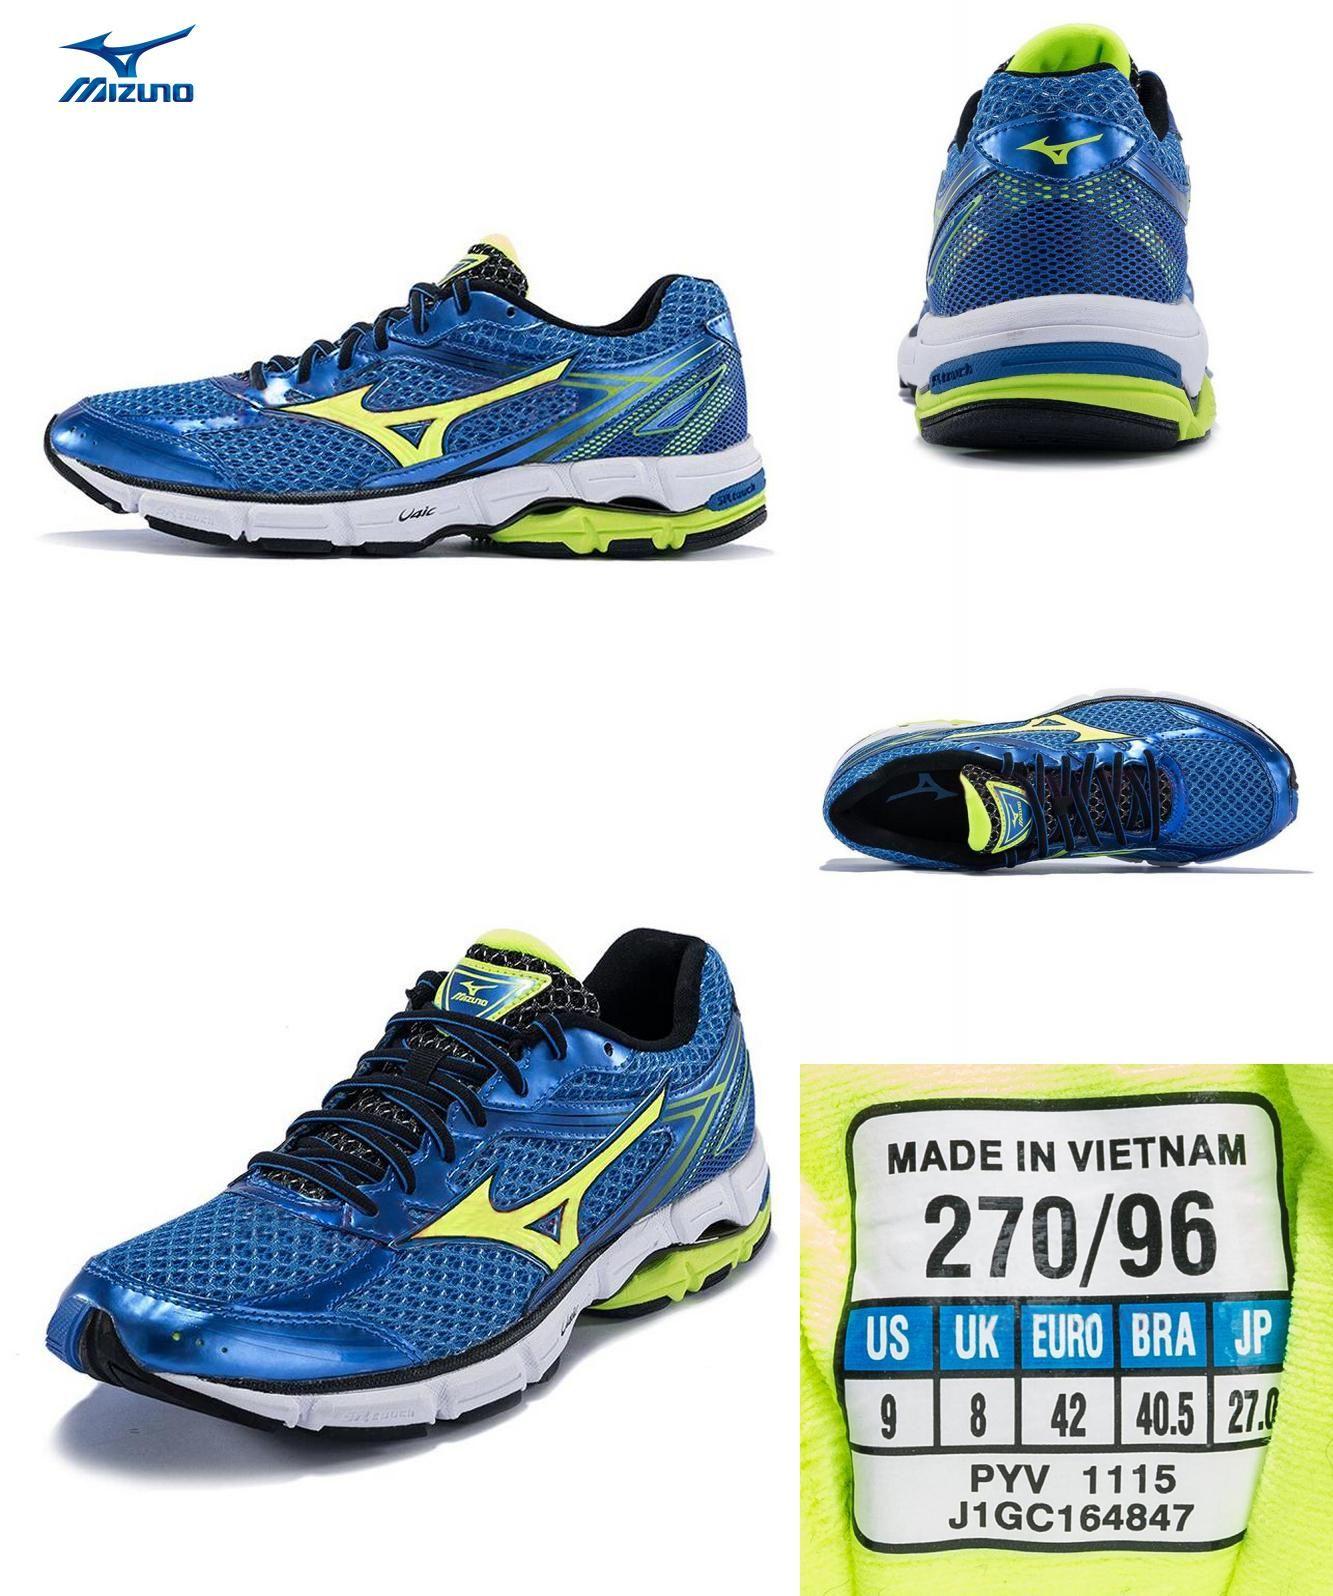 mens mizuno running shoes size 9.5 europe homme golden